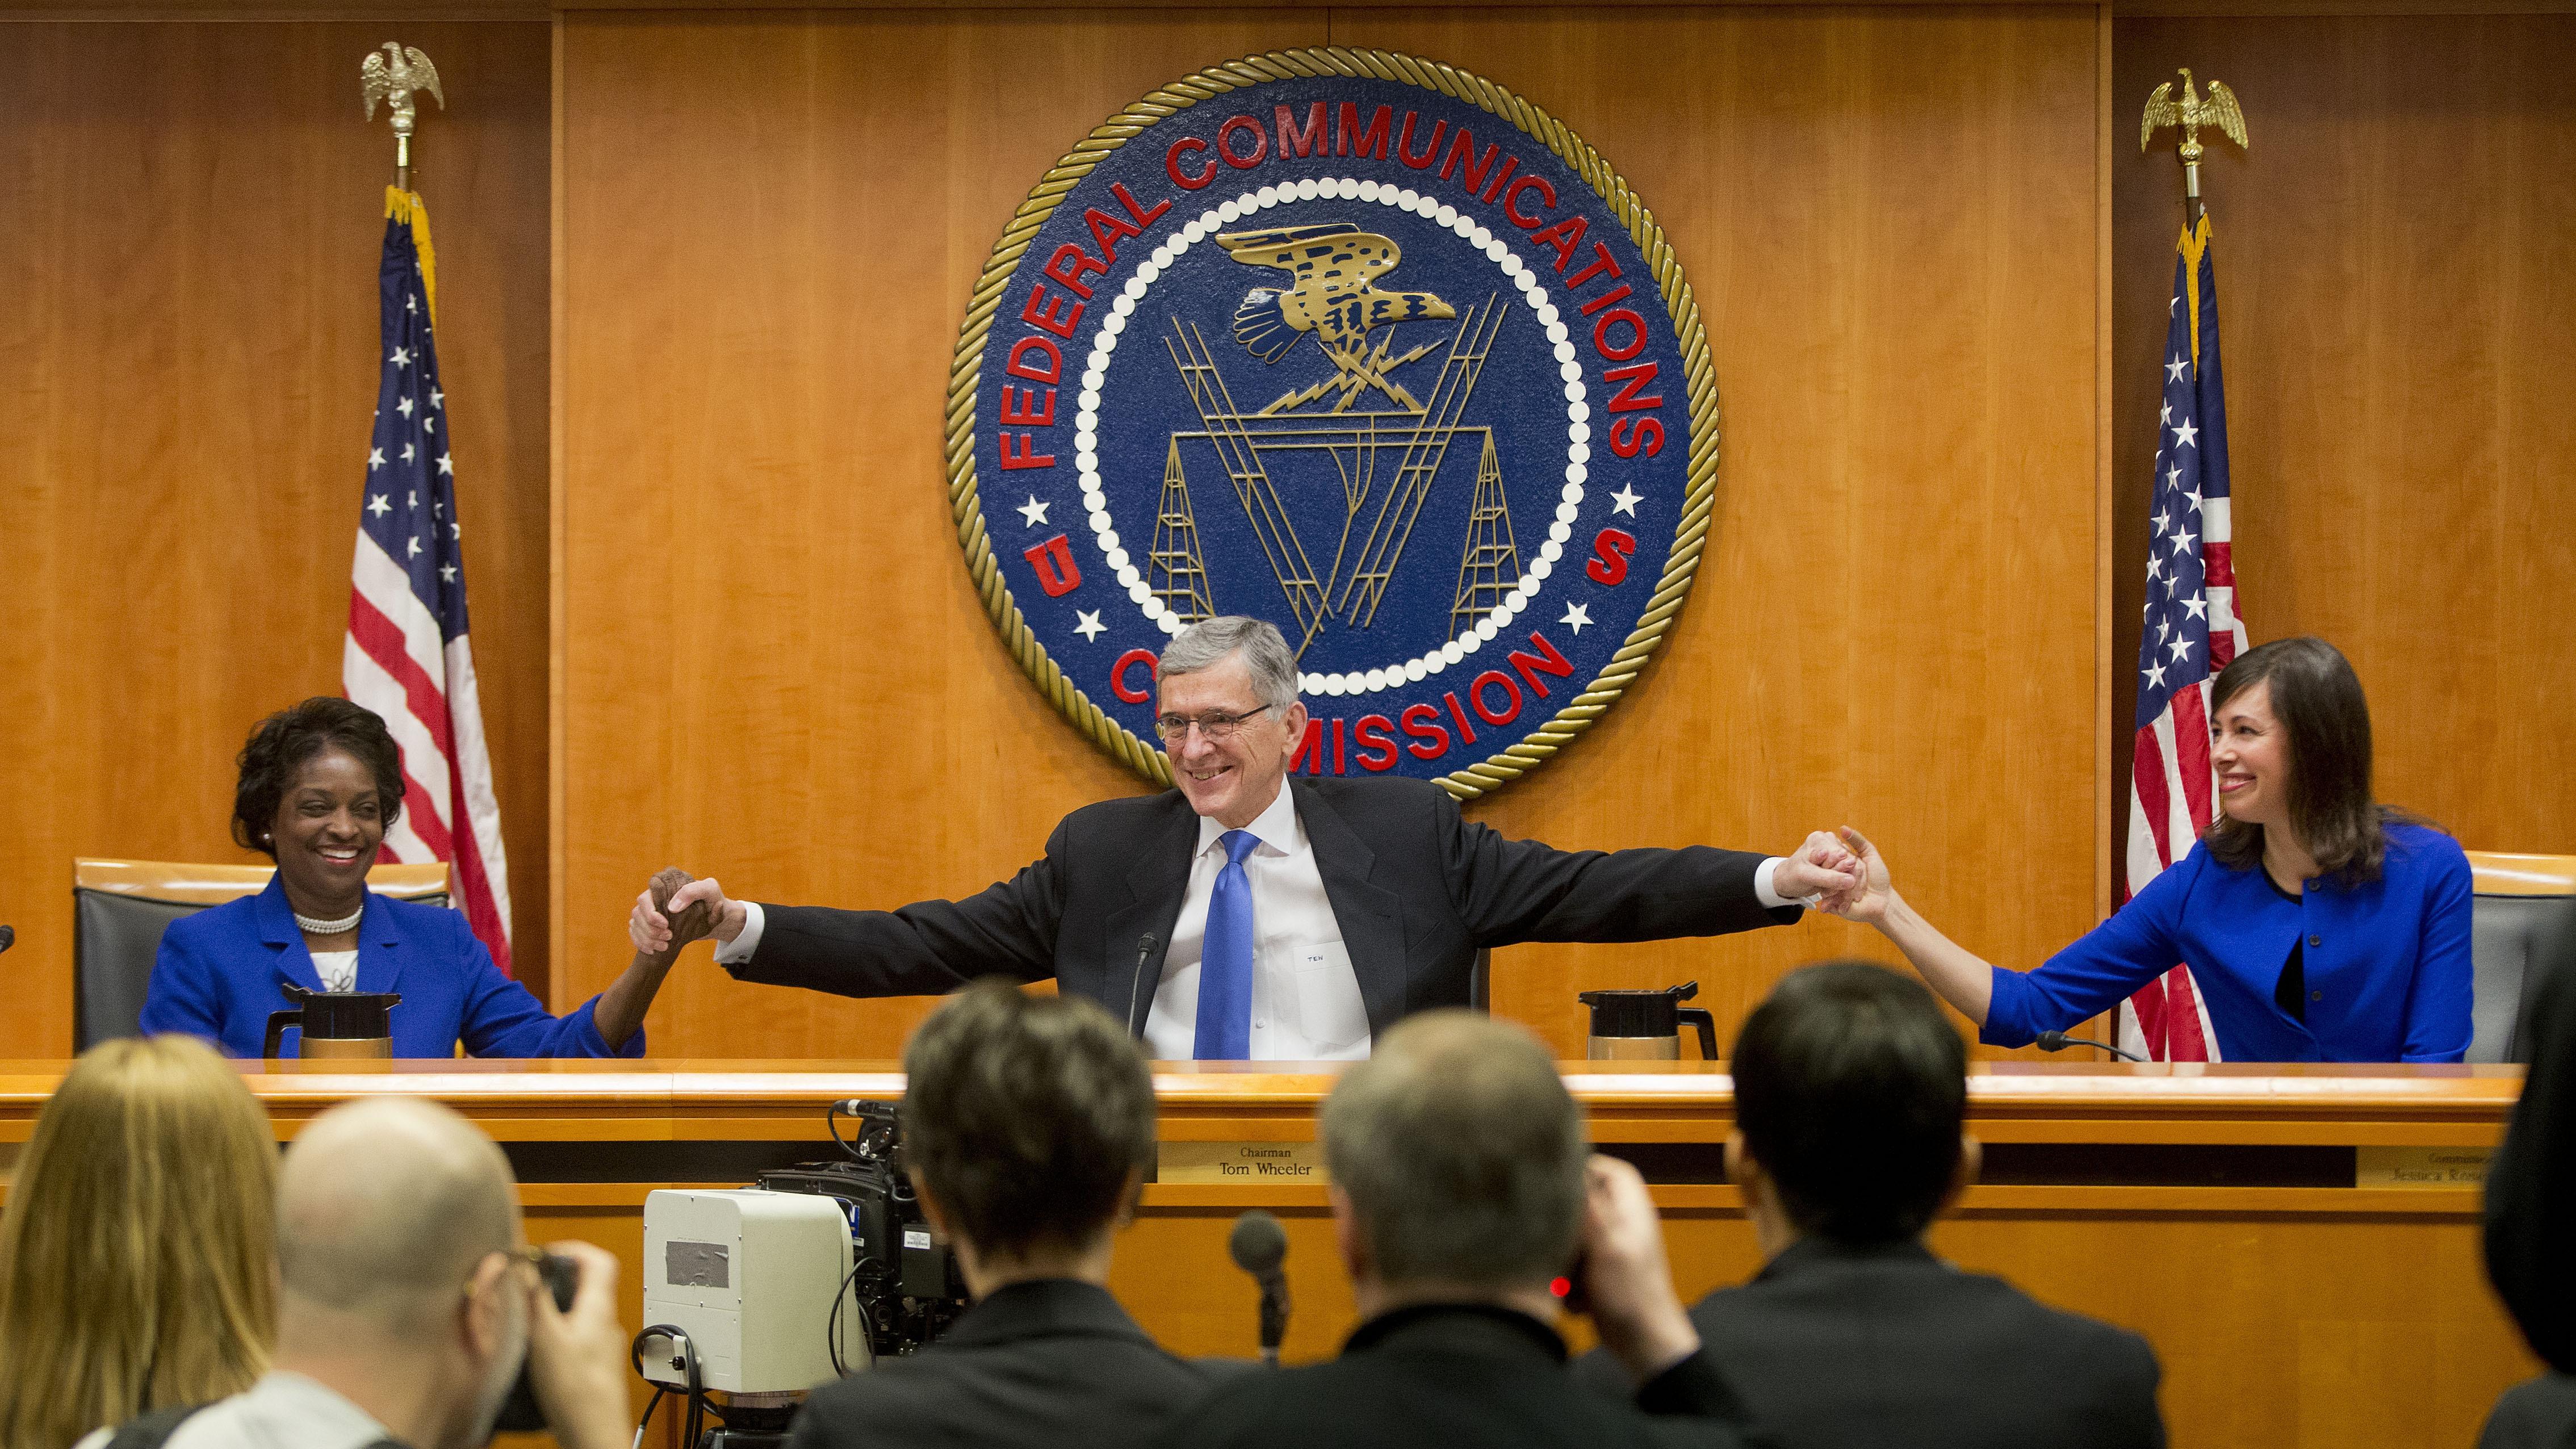 U.S. Appeals Court Upholds Net Neutrality Rules In Full